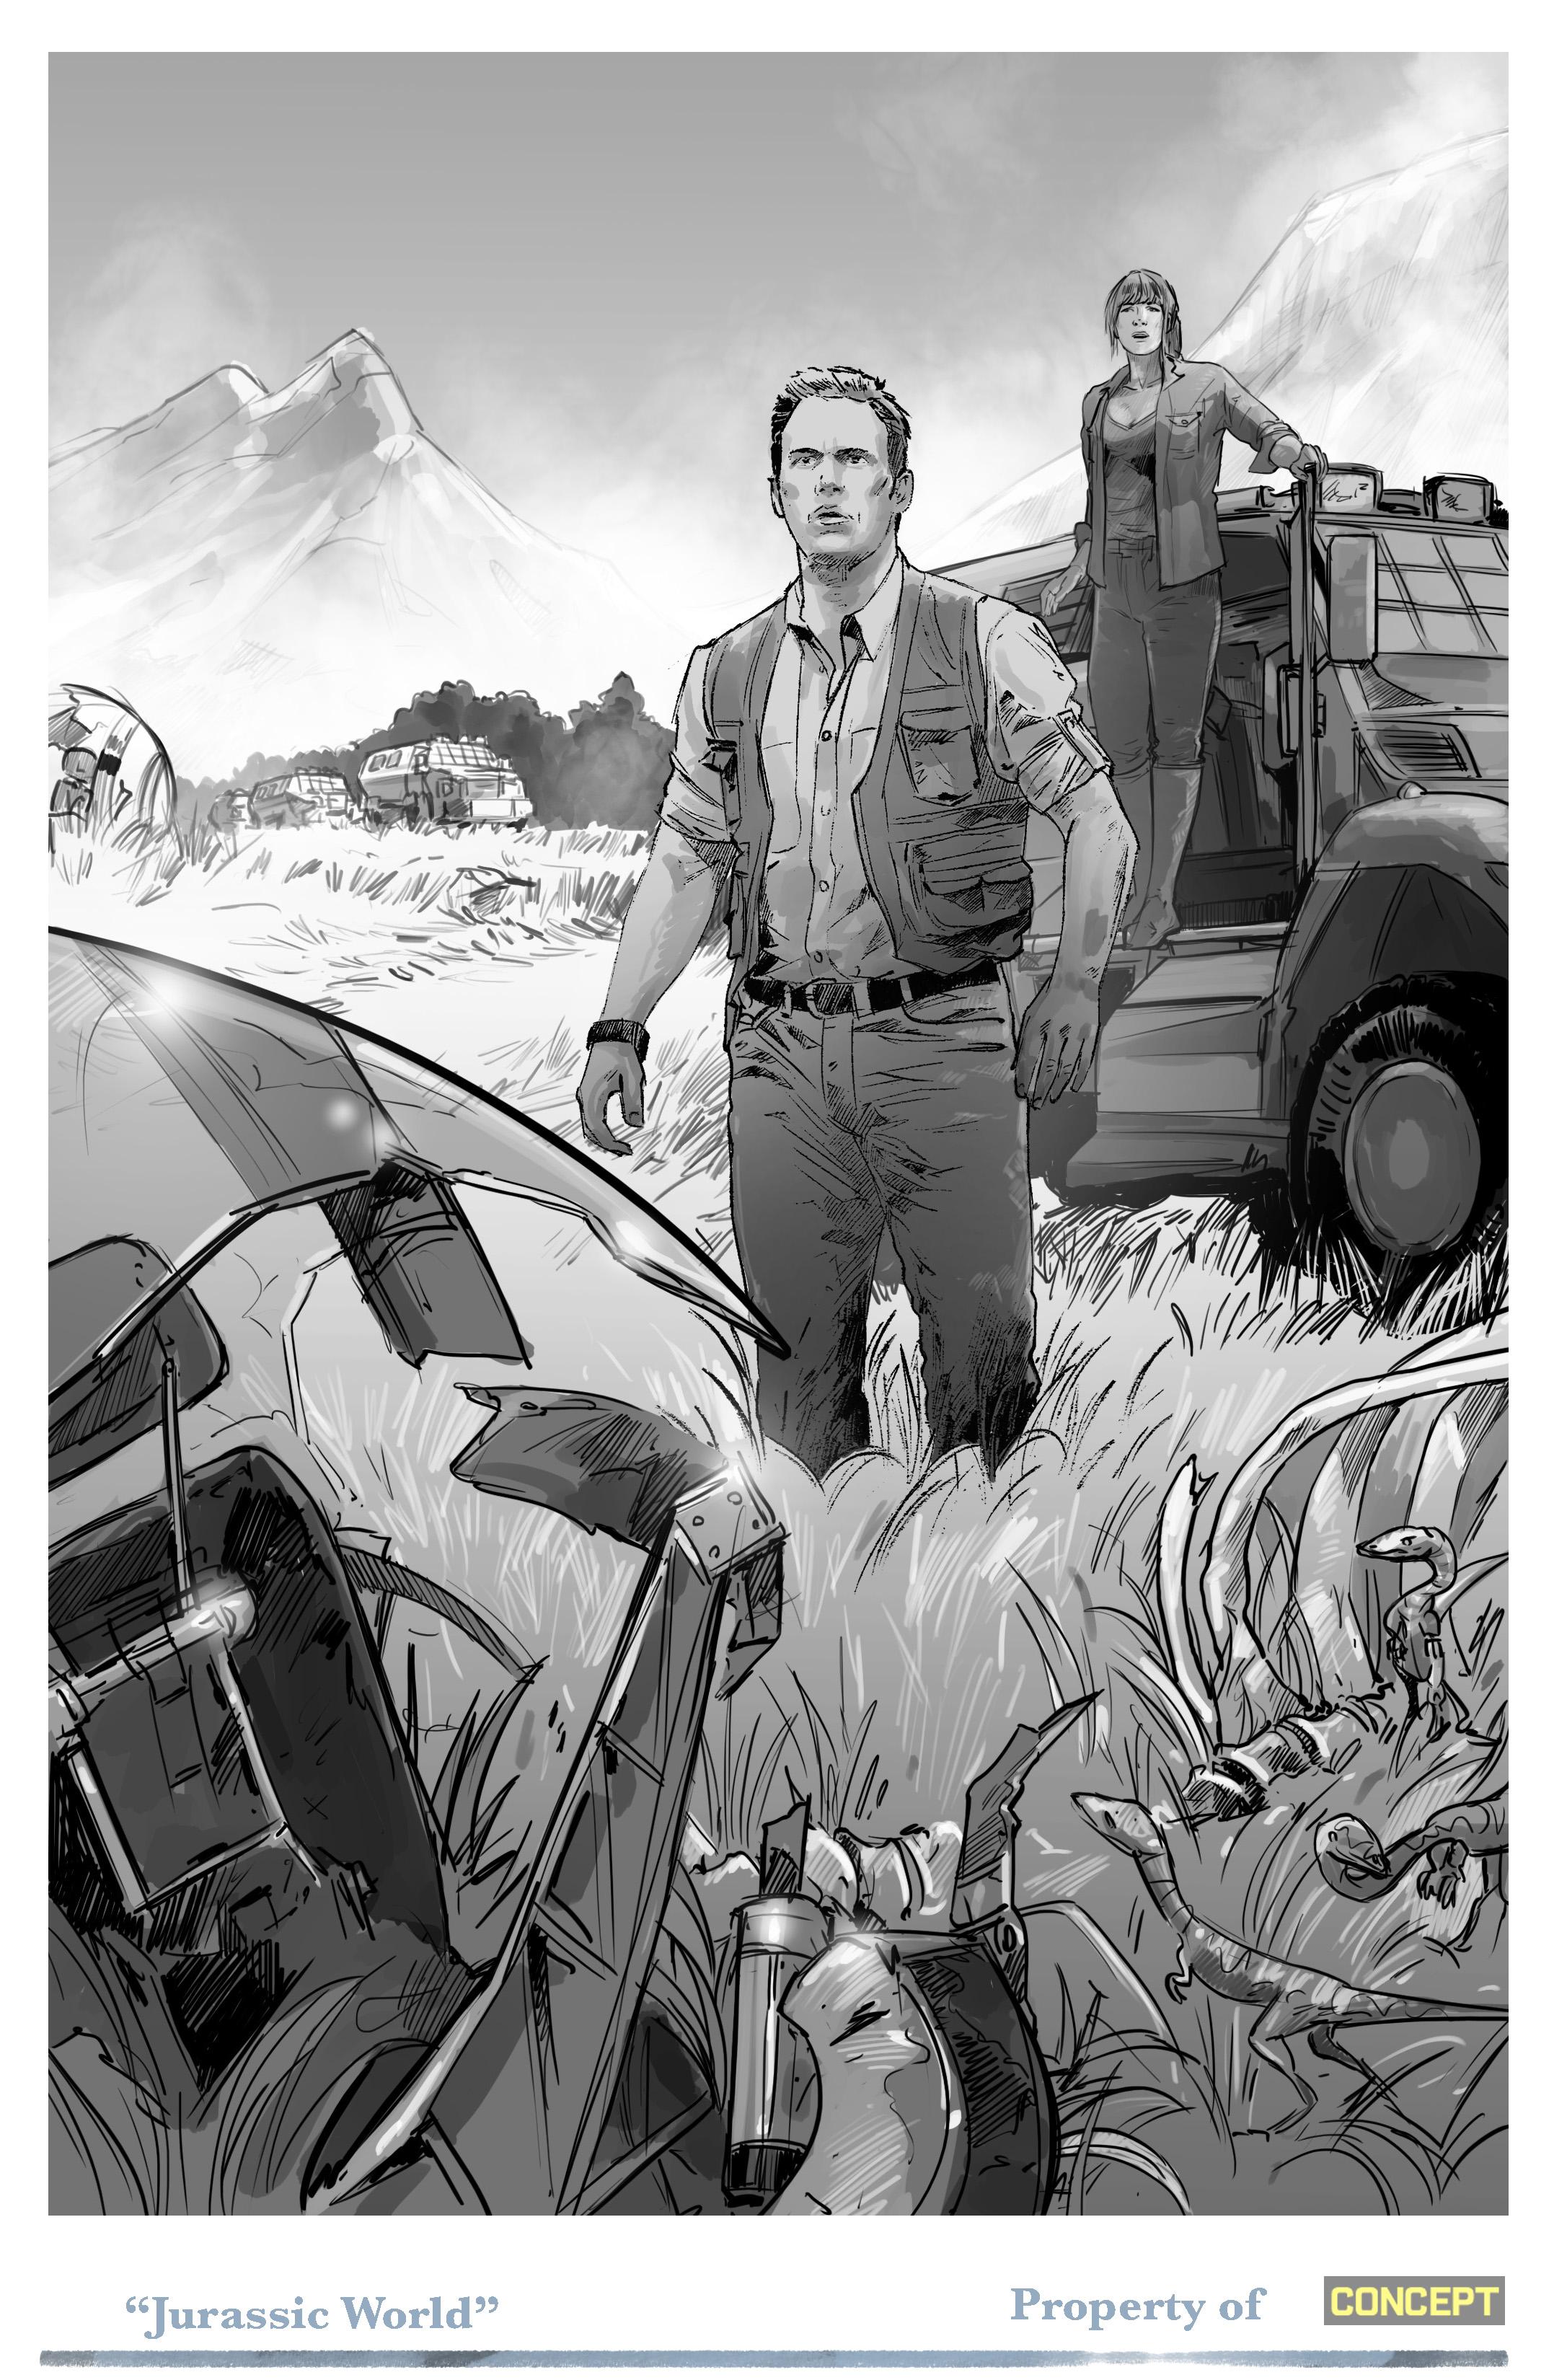 Sketch art pages_Jurassic W_002.jpg